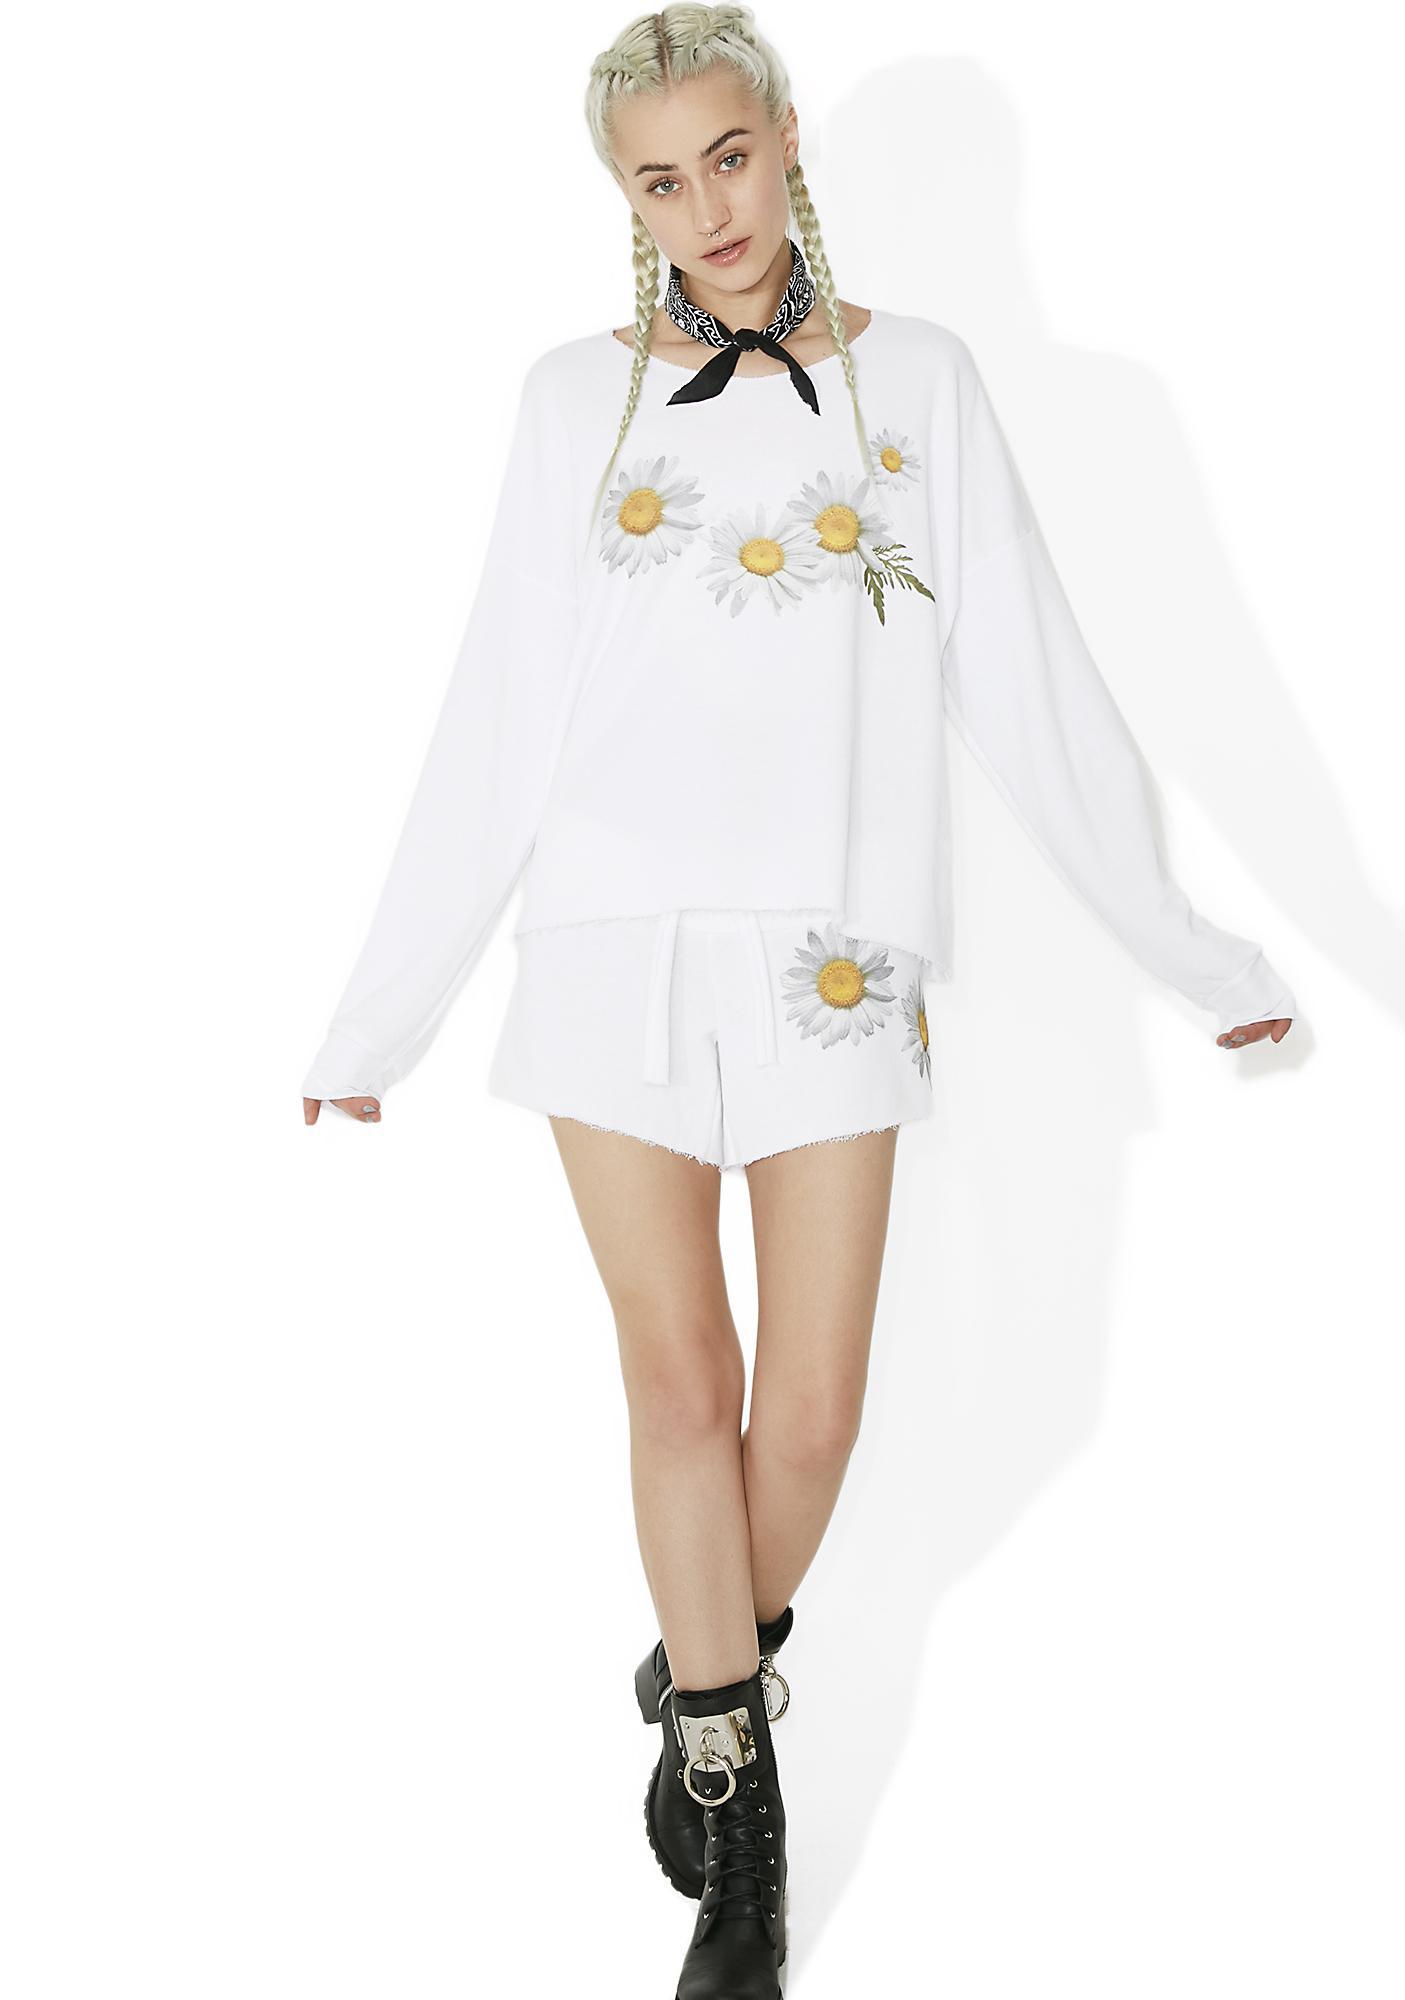 Wildfox Couture Fresh As A Daisy 5AM Sweatshirt